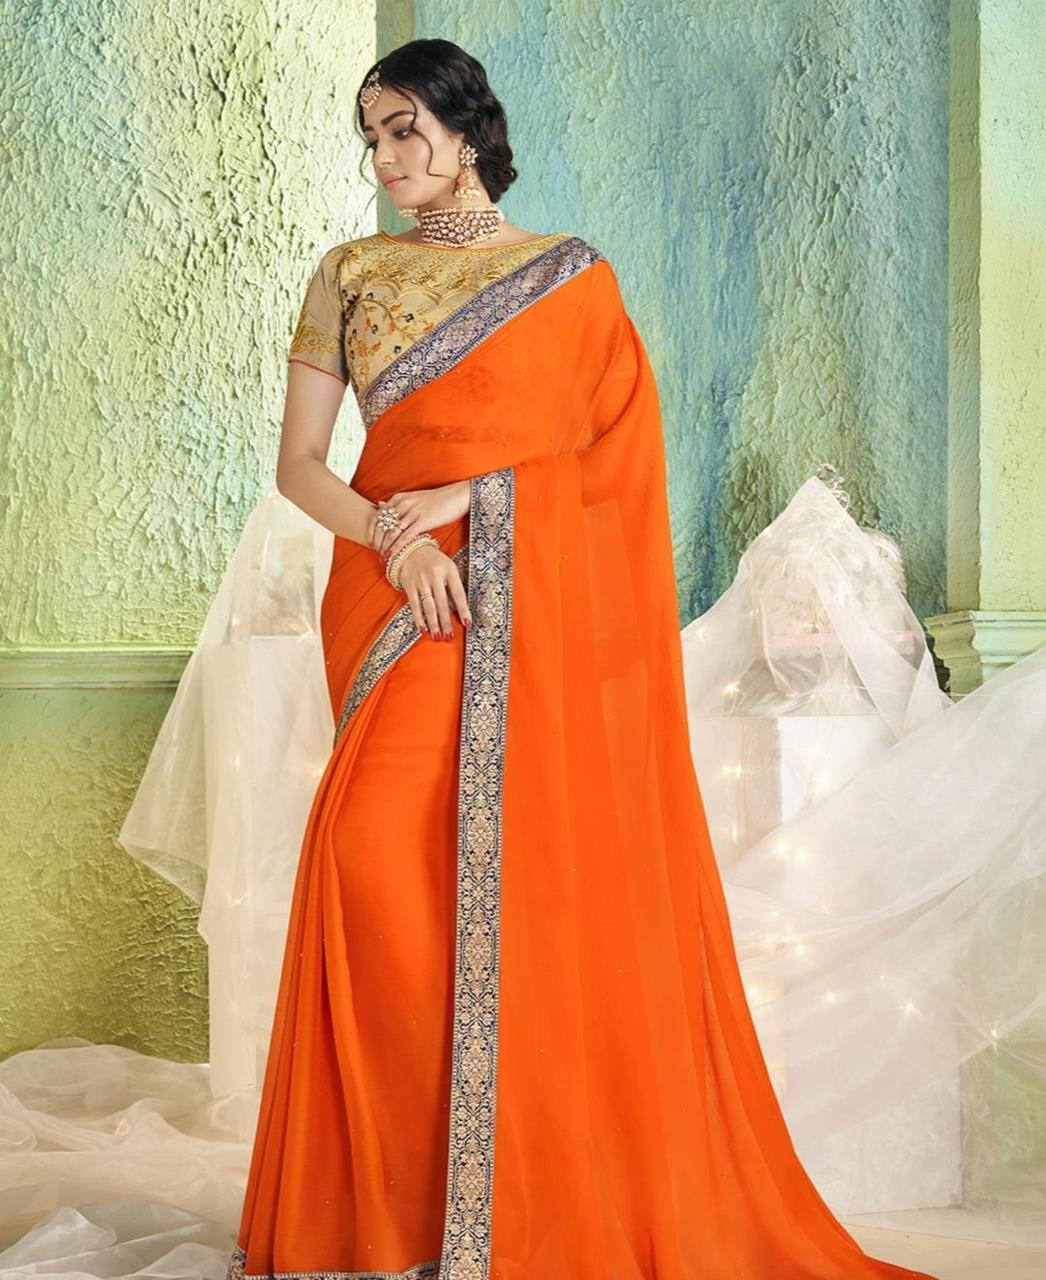 Border Work Chiffon Saree (Sari) in Orange